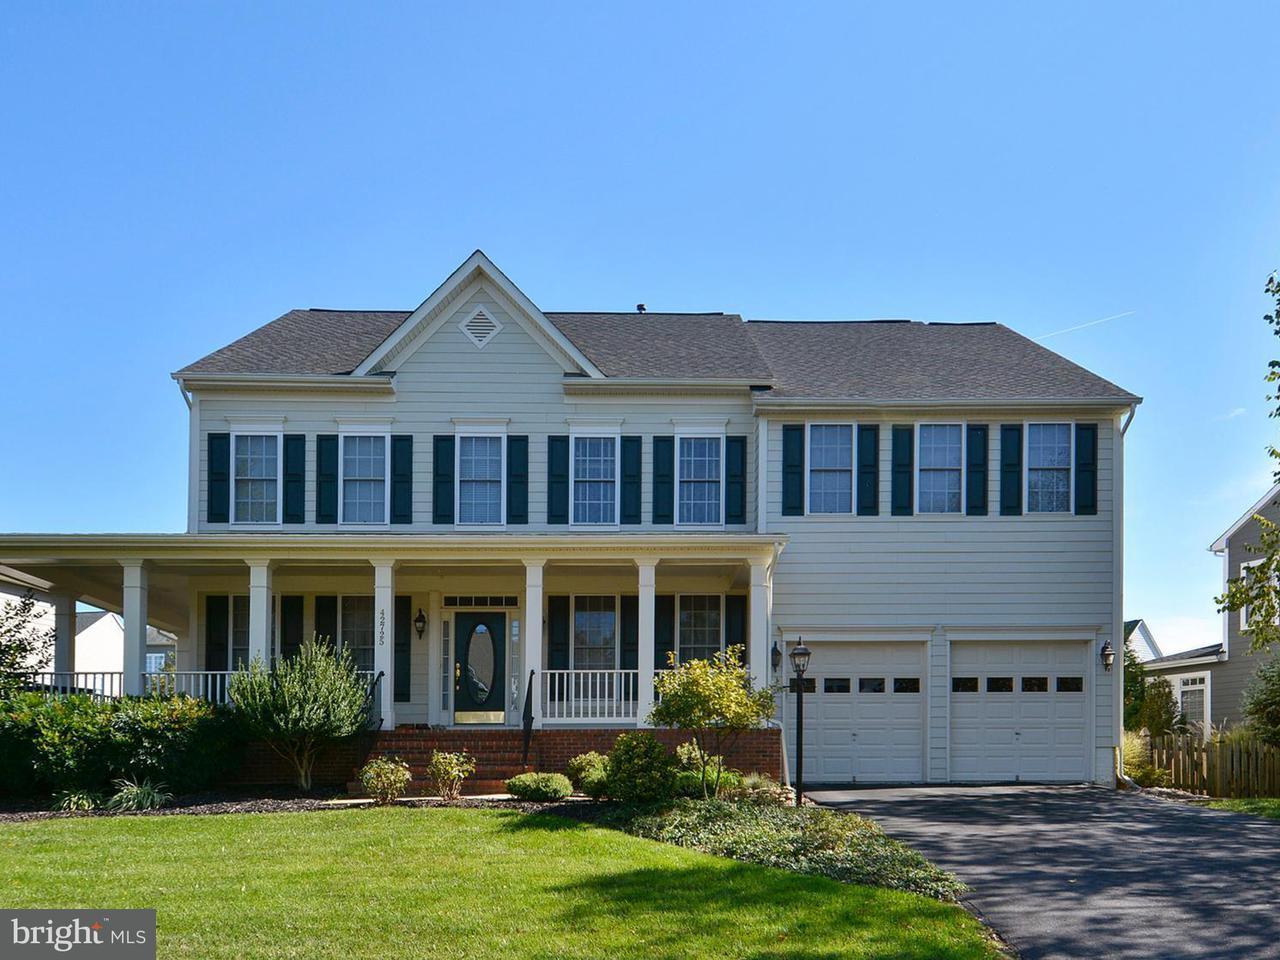 Single Family Home for Sale at 42725 Ridgeway Drive 42725 Ridgeway Drive Broadlands, Virginia 20148 United States